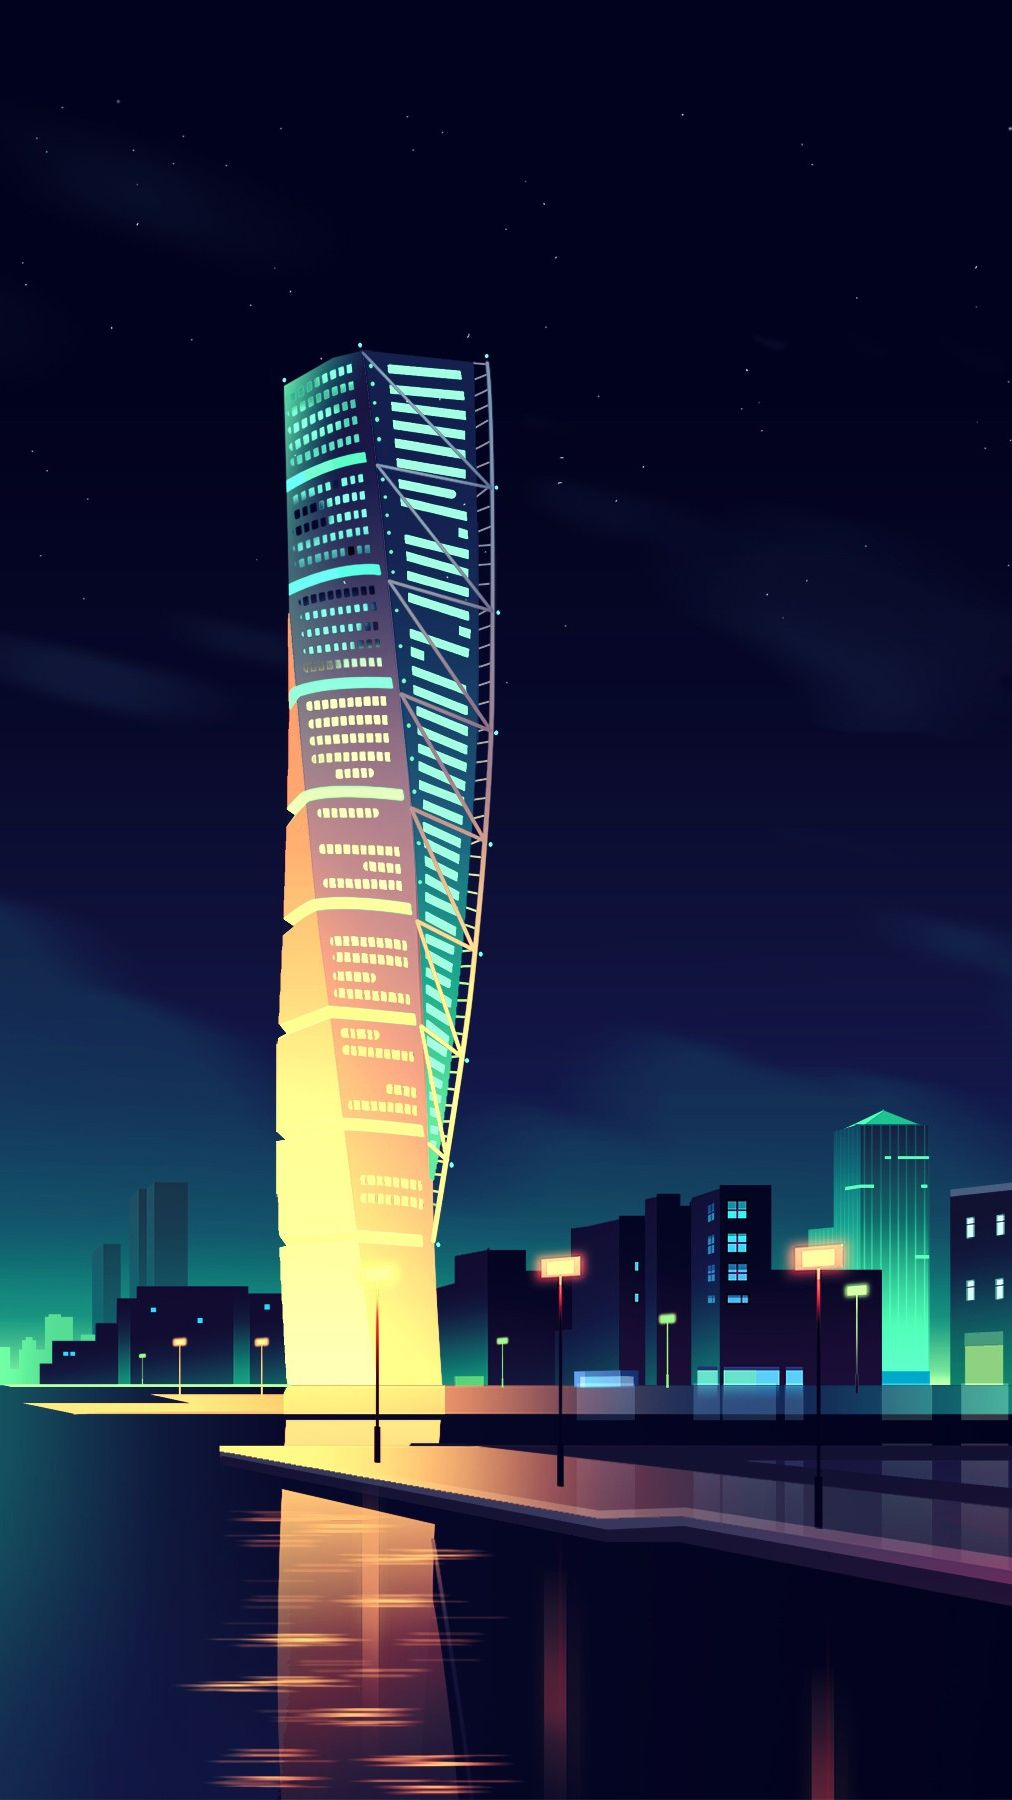 Animated Night City Wallpaper Iphone Wallpaper City Iphone Wallpaper Christmas Lights Wallpaper City Wallpaper